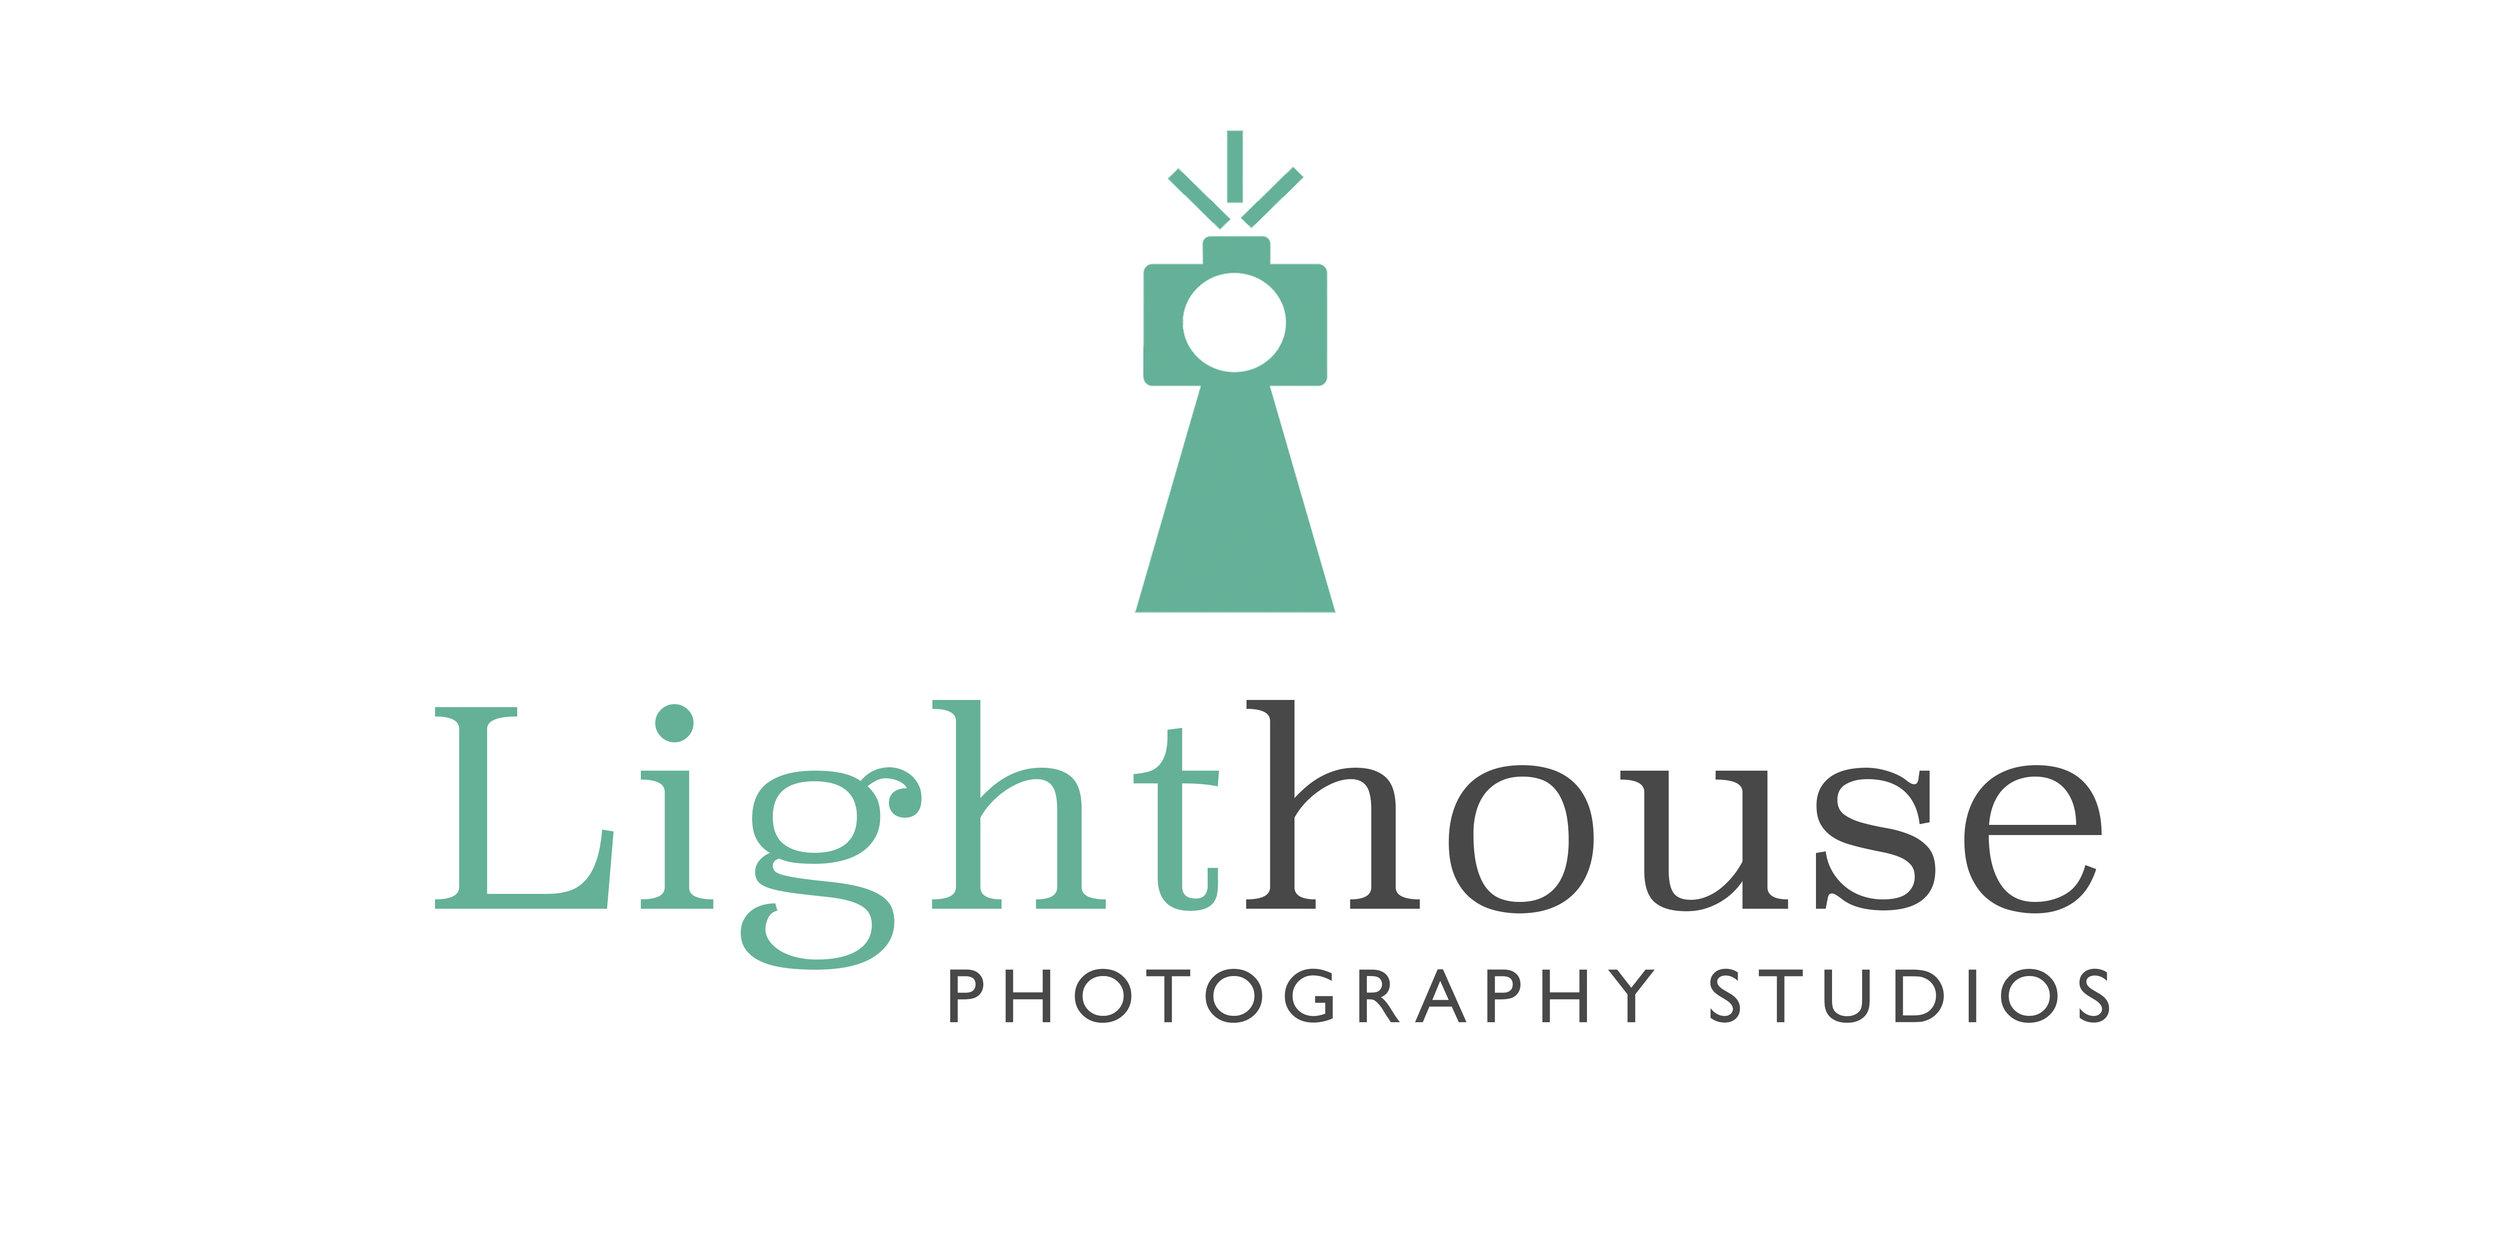 Lighthouse logo 1.jpg